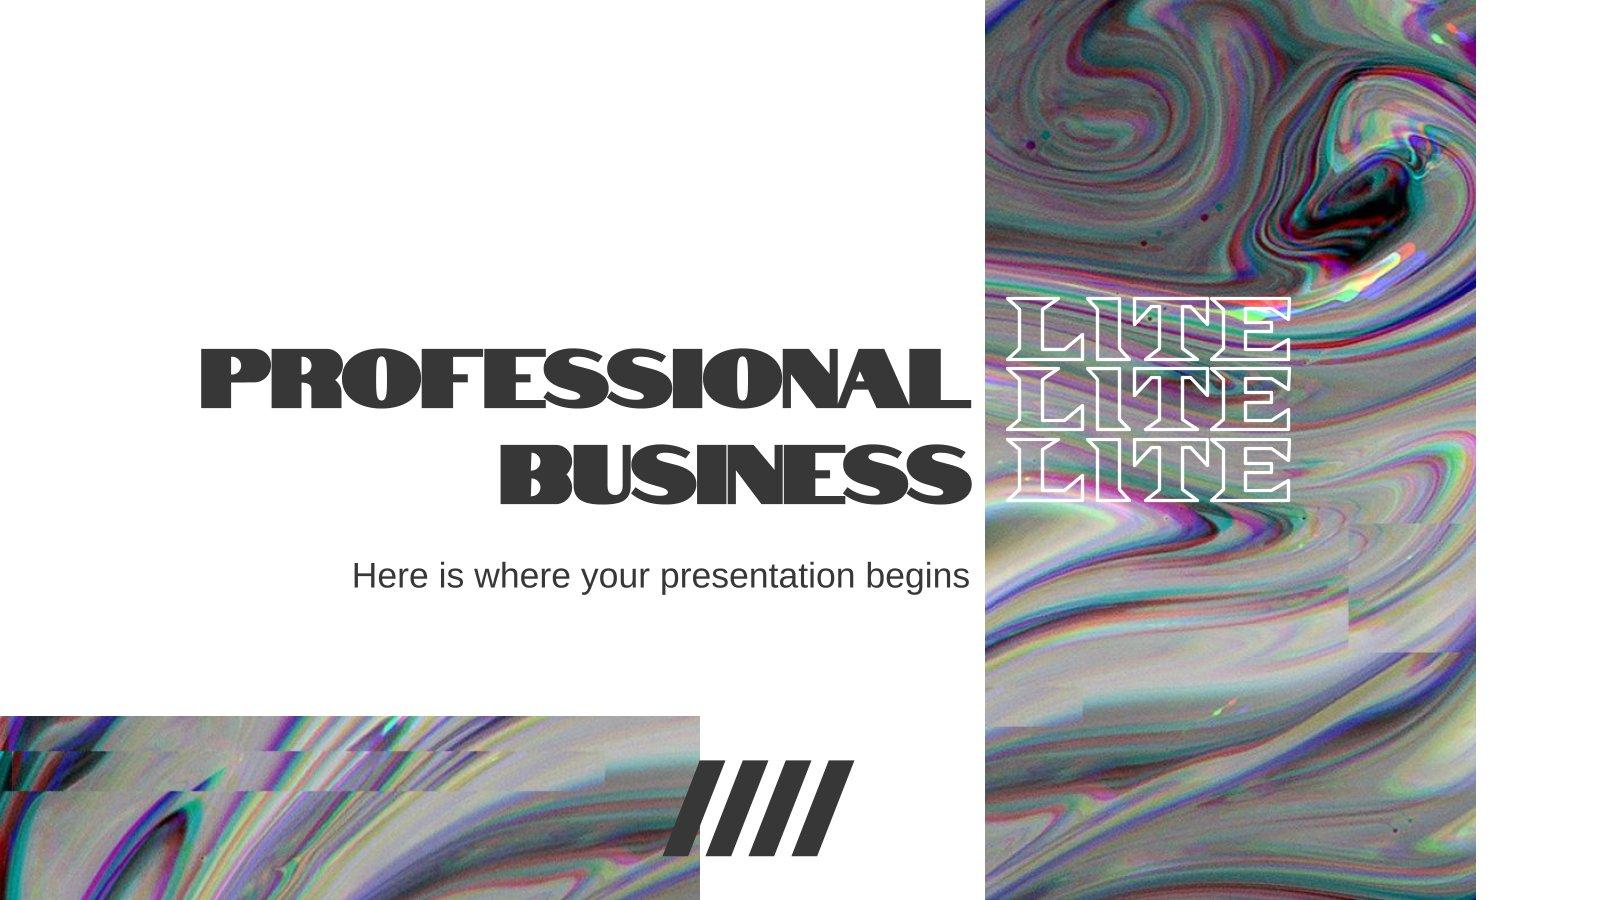 Professional Business LITE presentation template